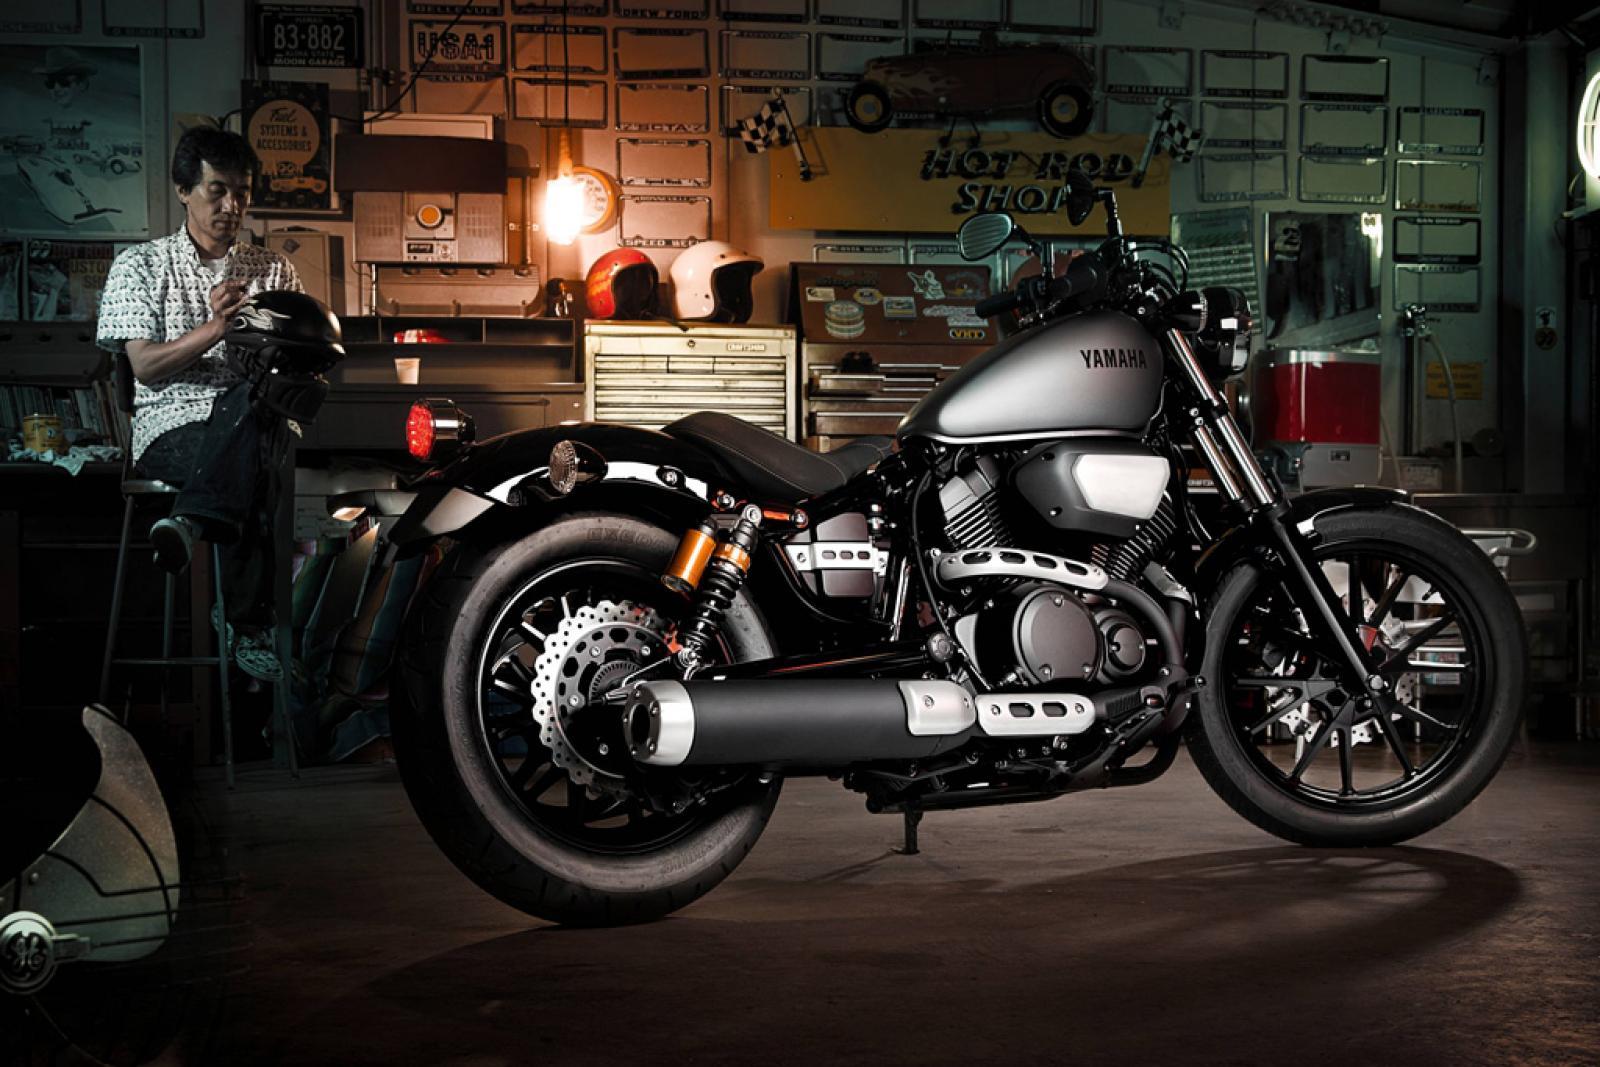 Тест-драйв мотоцикла Yamaha XV950 Bolt